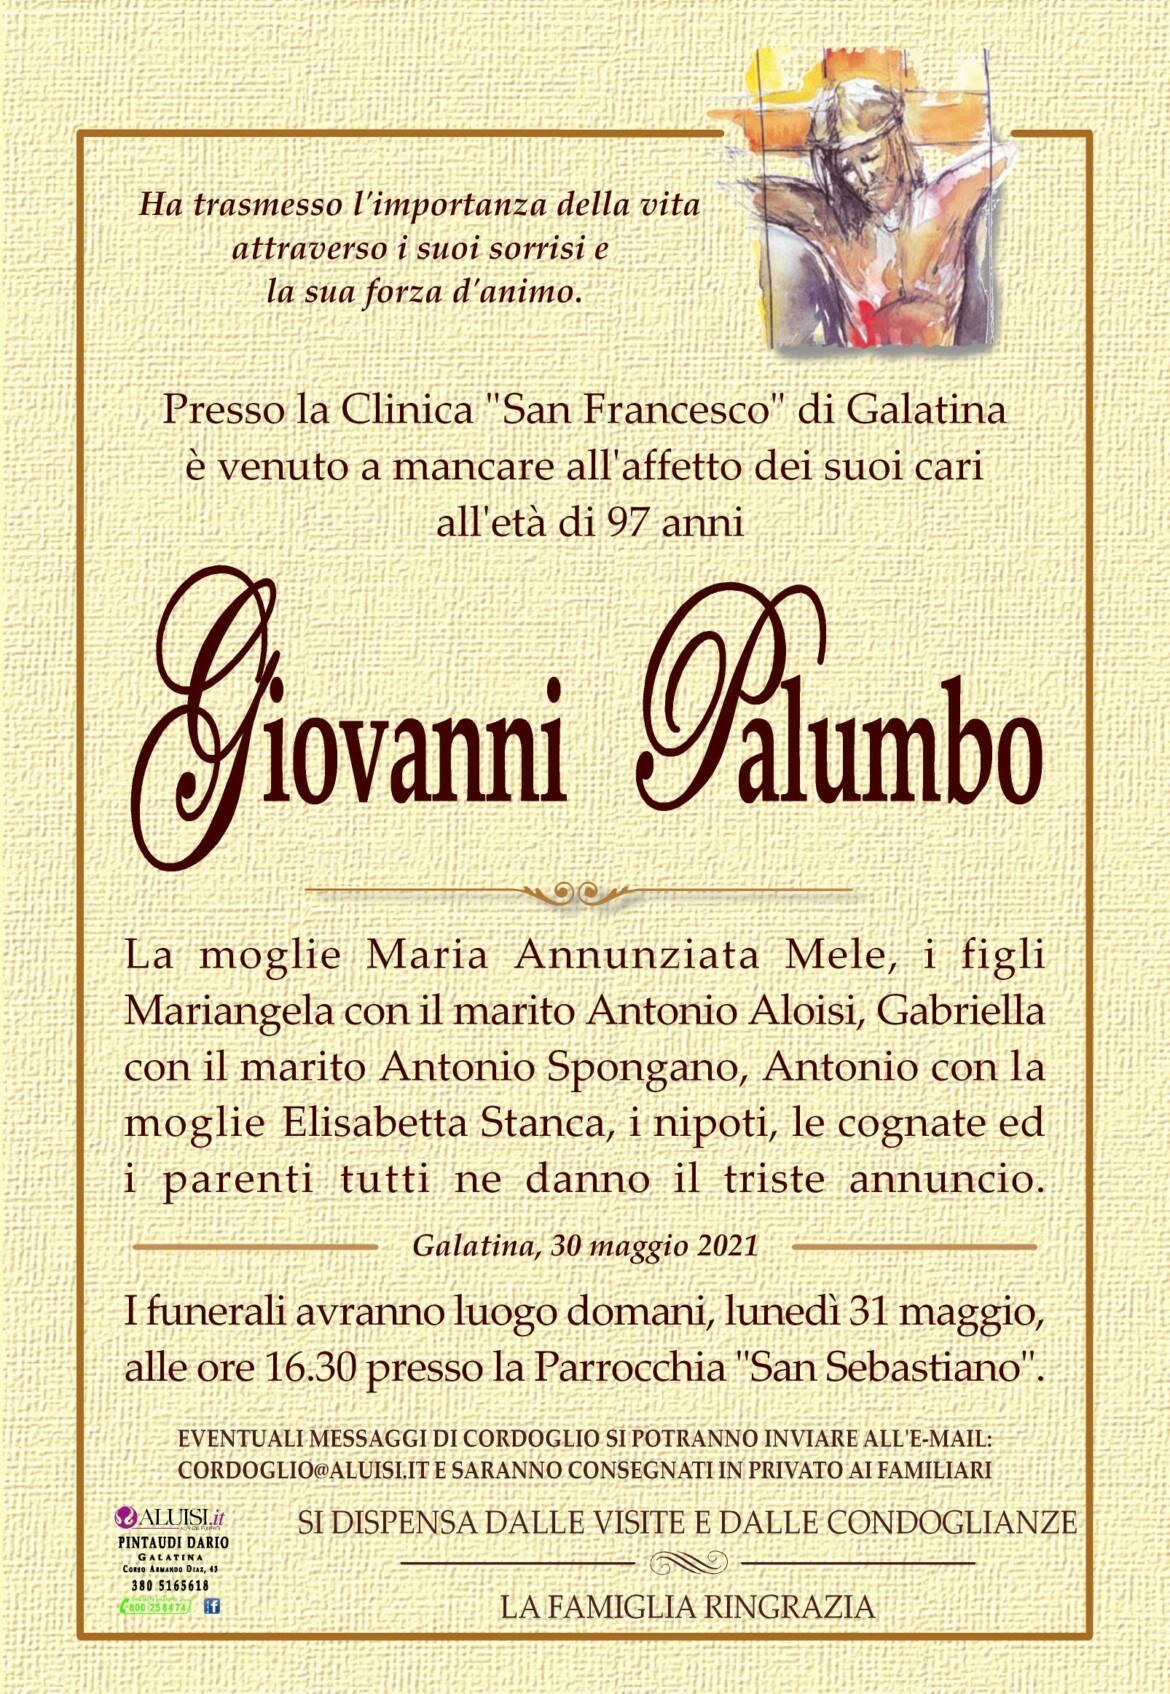 Annuncio-GIOVANNI-PALUMBO-GALATINA-1.jpg